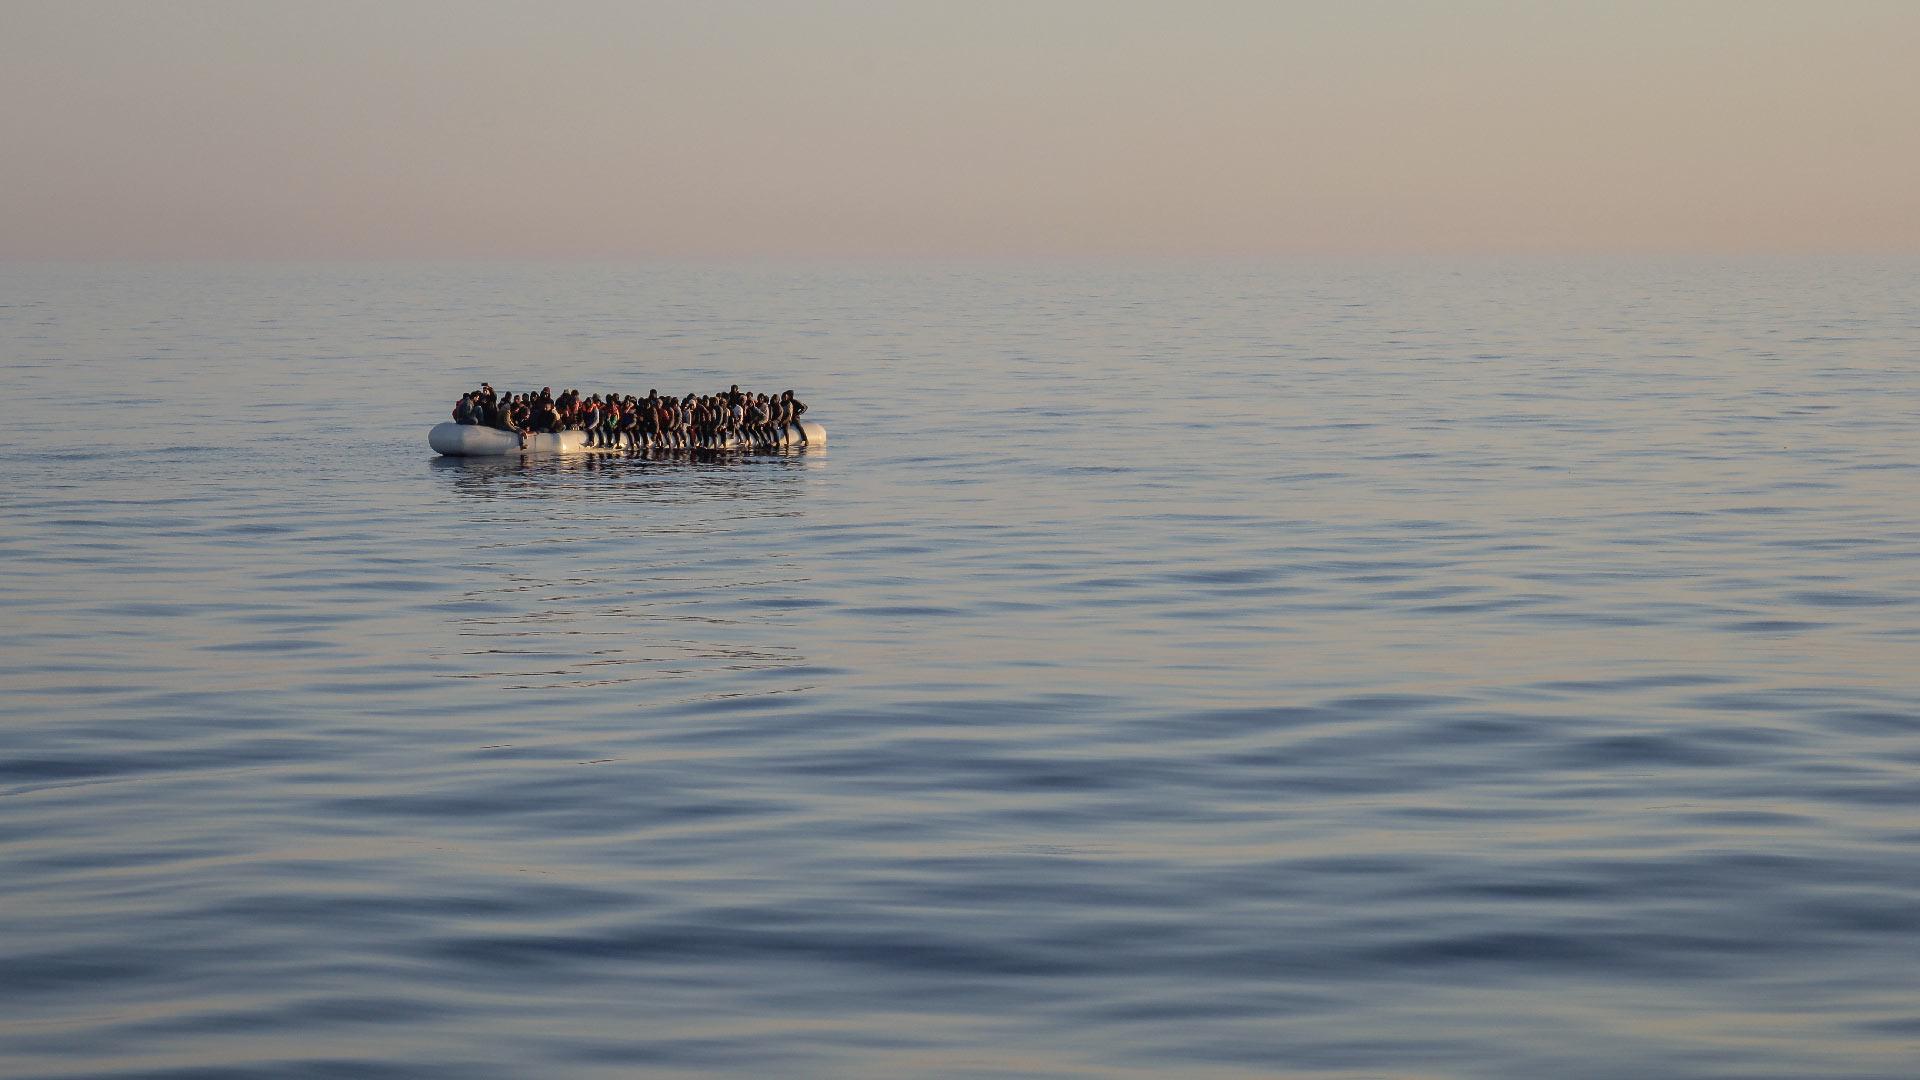 sauvetage-migrants-mediterranee-SAR-zodiac-bertoluzzi-inkyfada-1920